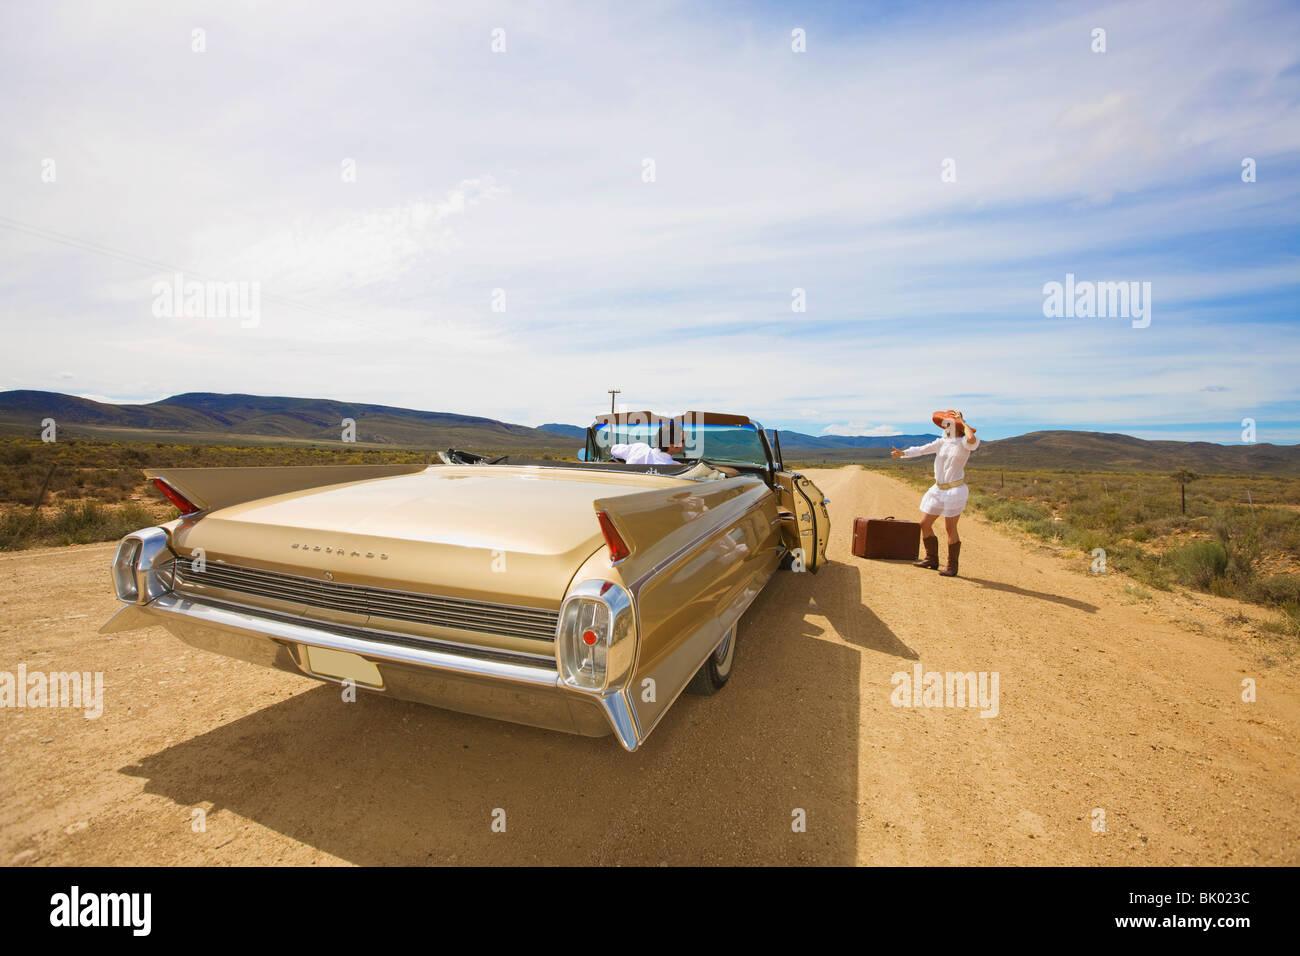 Woman hitching on desert road Stock Photo